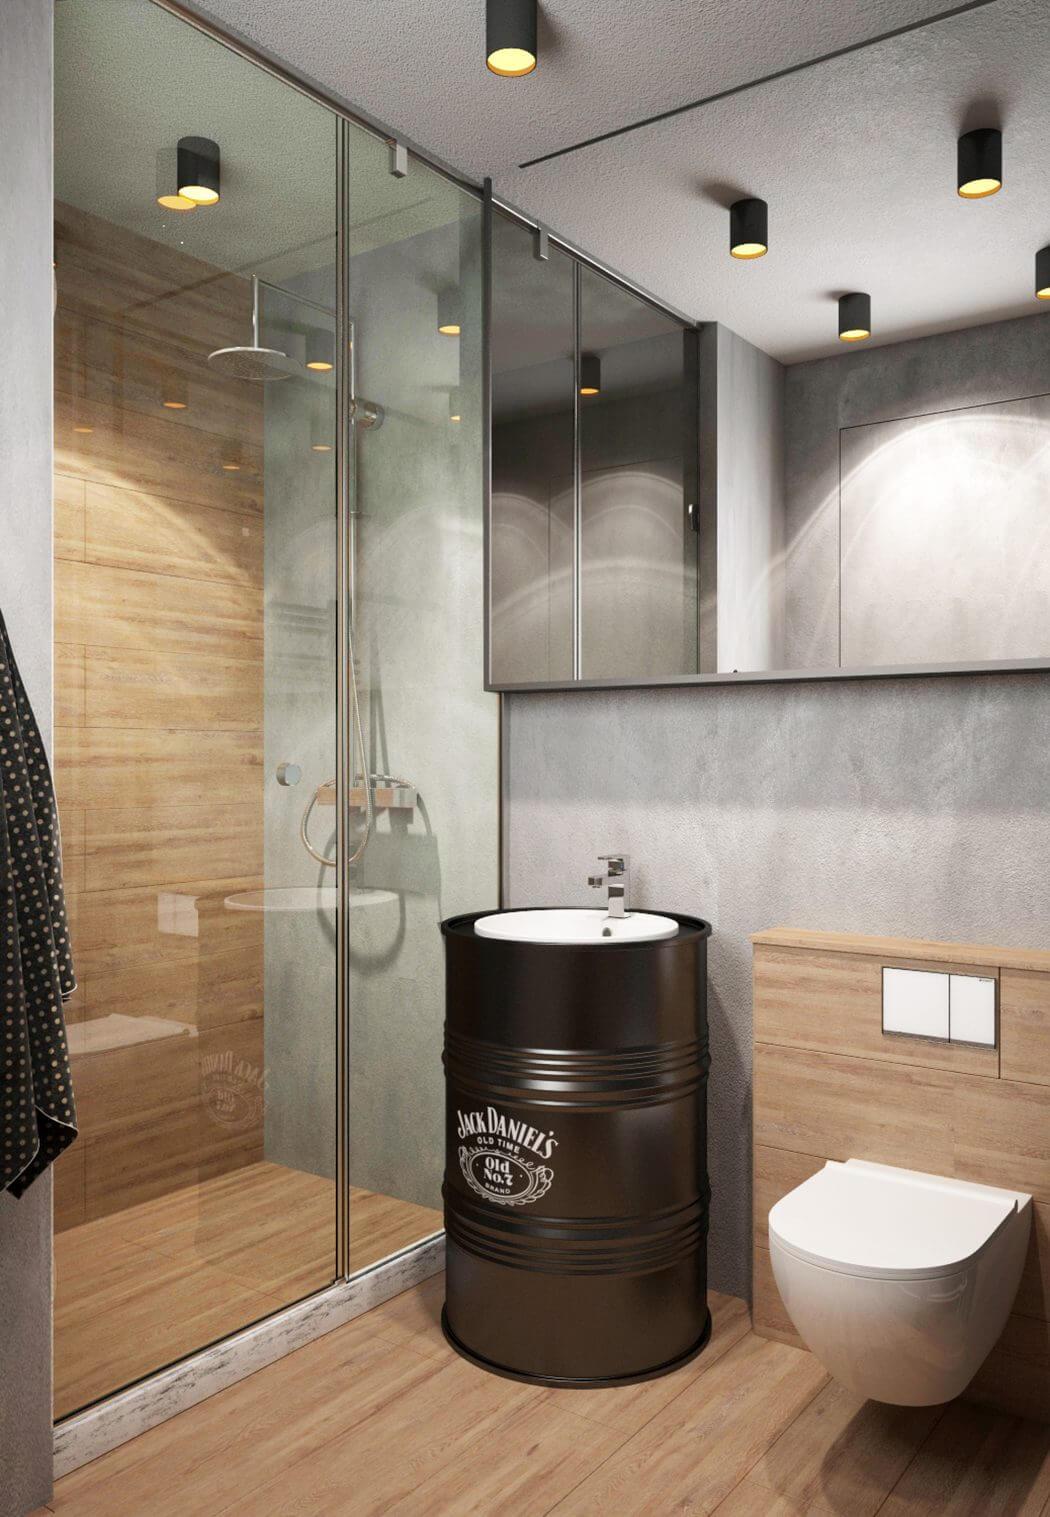 Klein industrieel loft appartement uit Moskou  Interieur